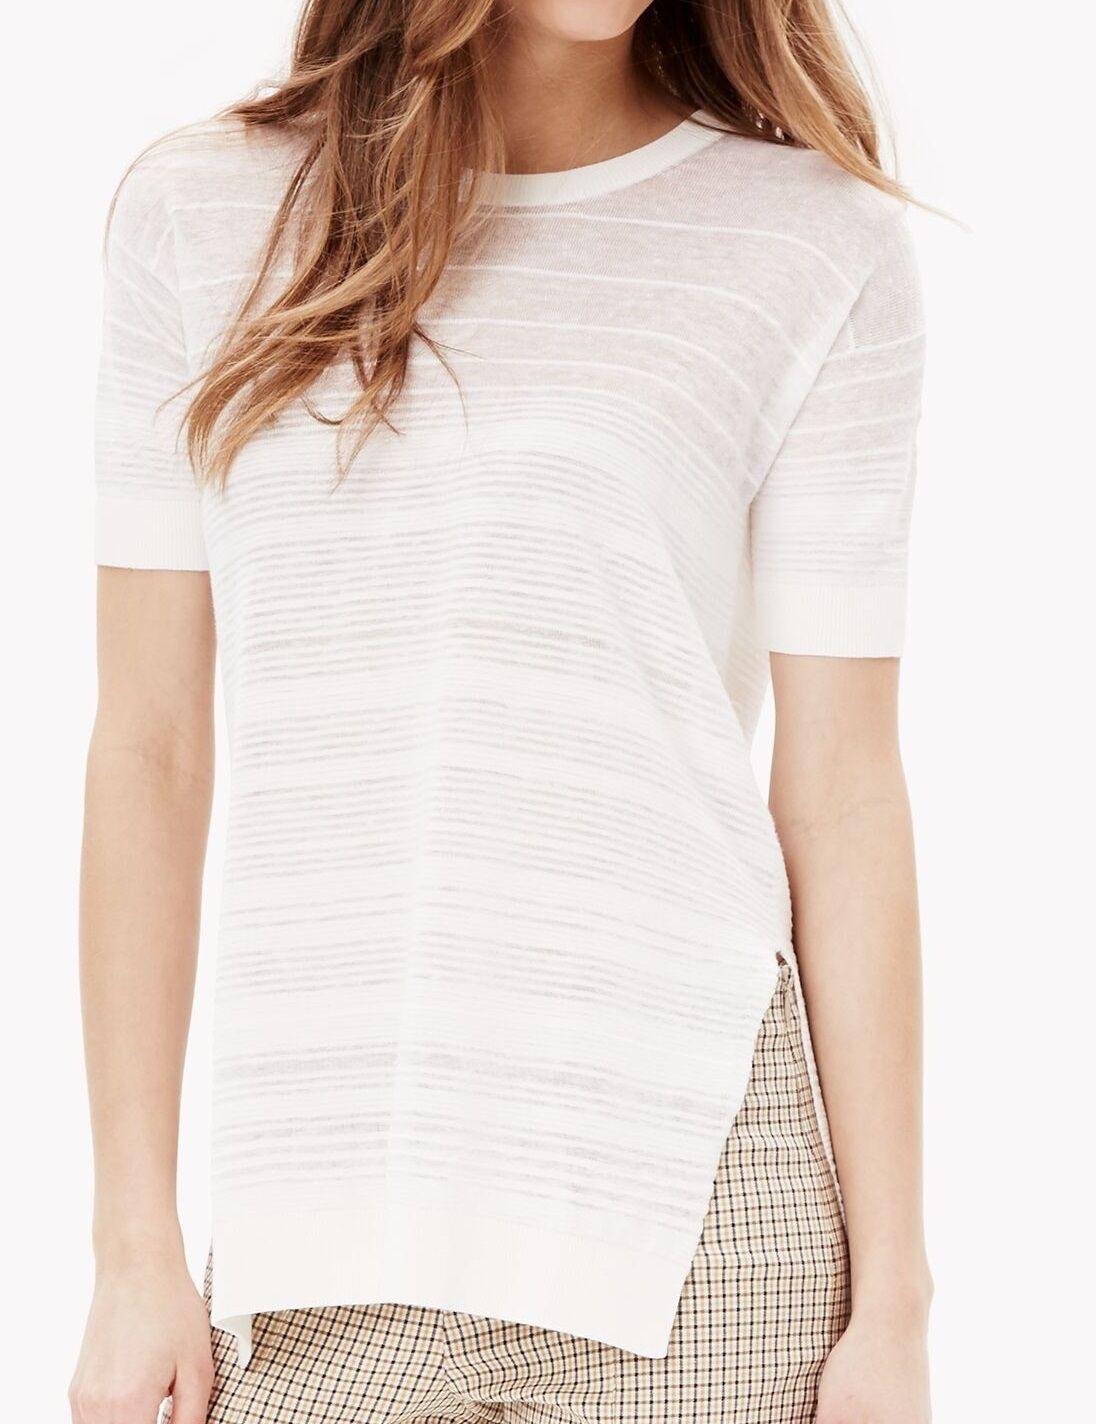 NWT  Theory Woherren Knit Variegated Stripe Linen Blend Tee